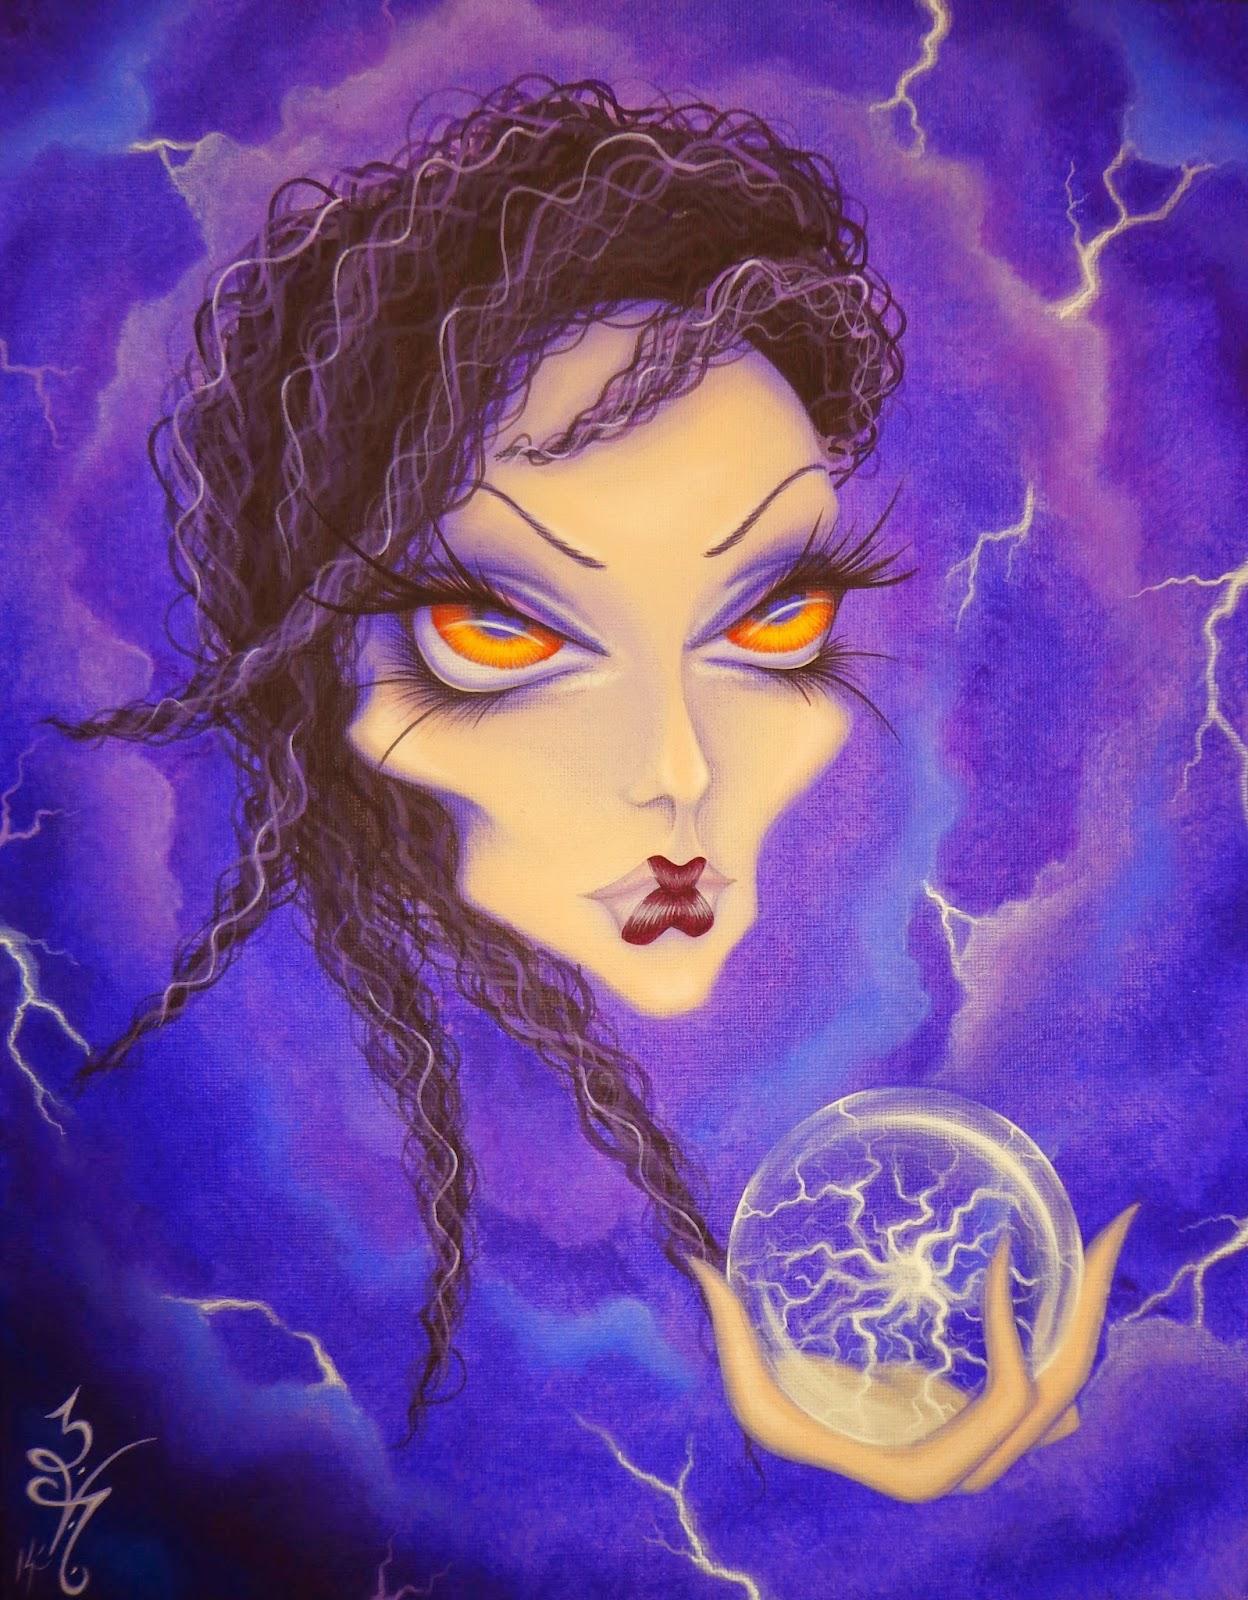 https://www.etsy.com/listing/191785367/original-fantasy-lowbrow-woman-girl-face?ref=shop_home_active_15